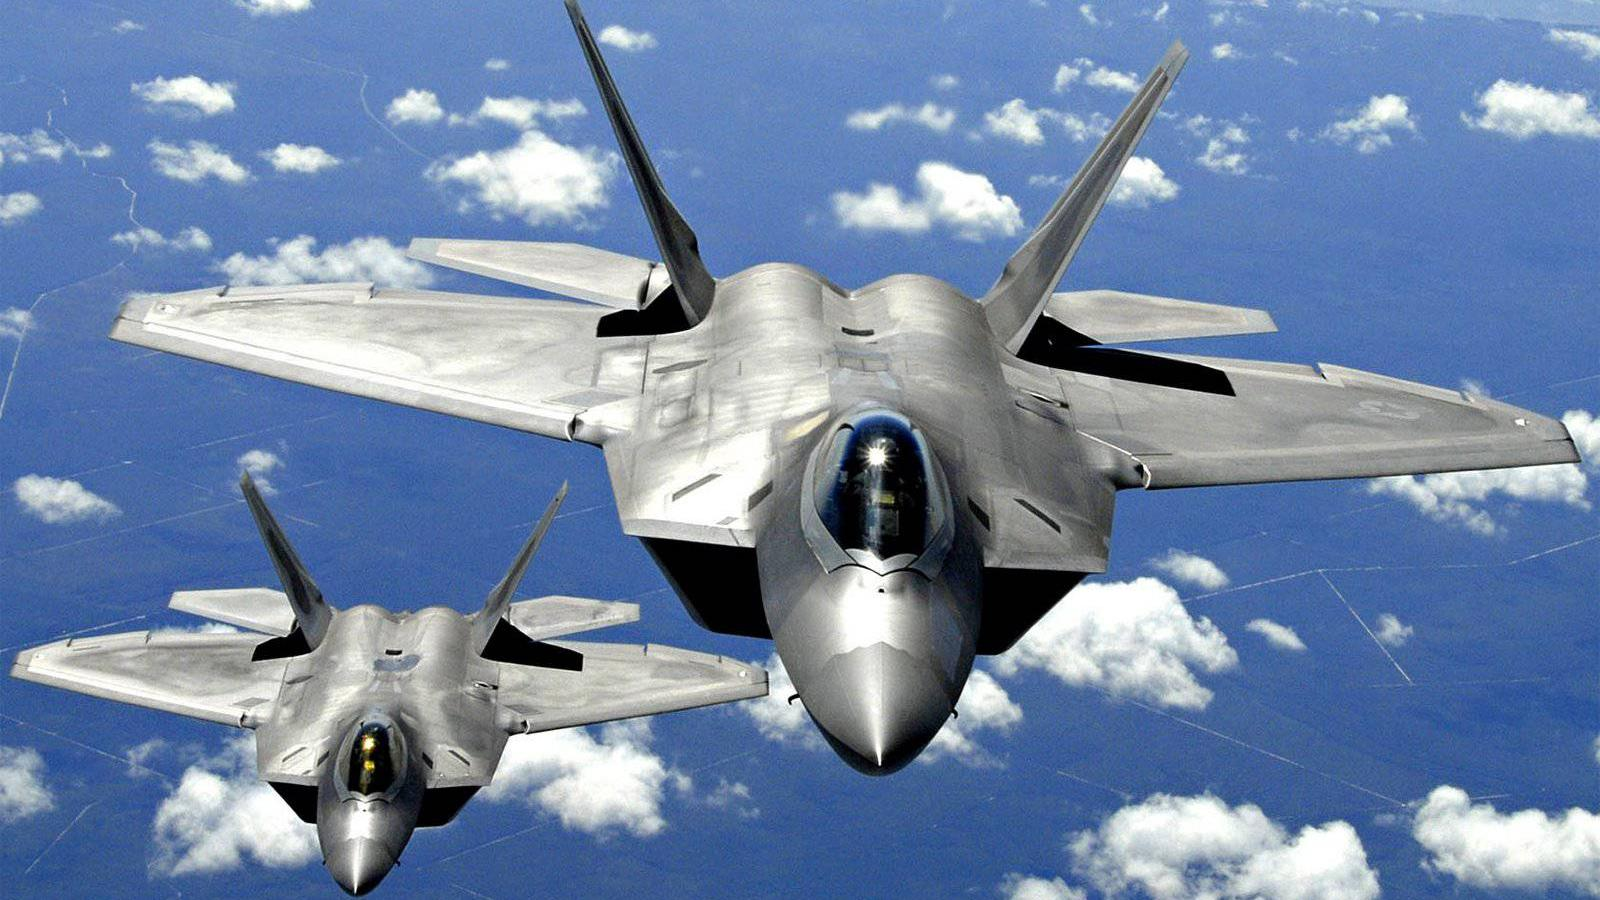 military f 22 raptor planes wallpaper [2] HQ WALLPAPER   521 1600x900